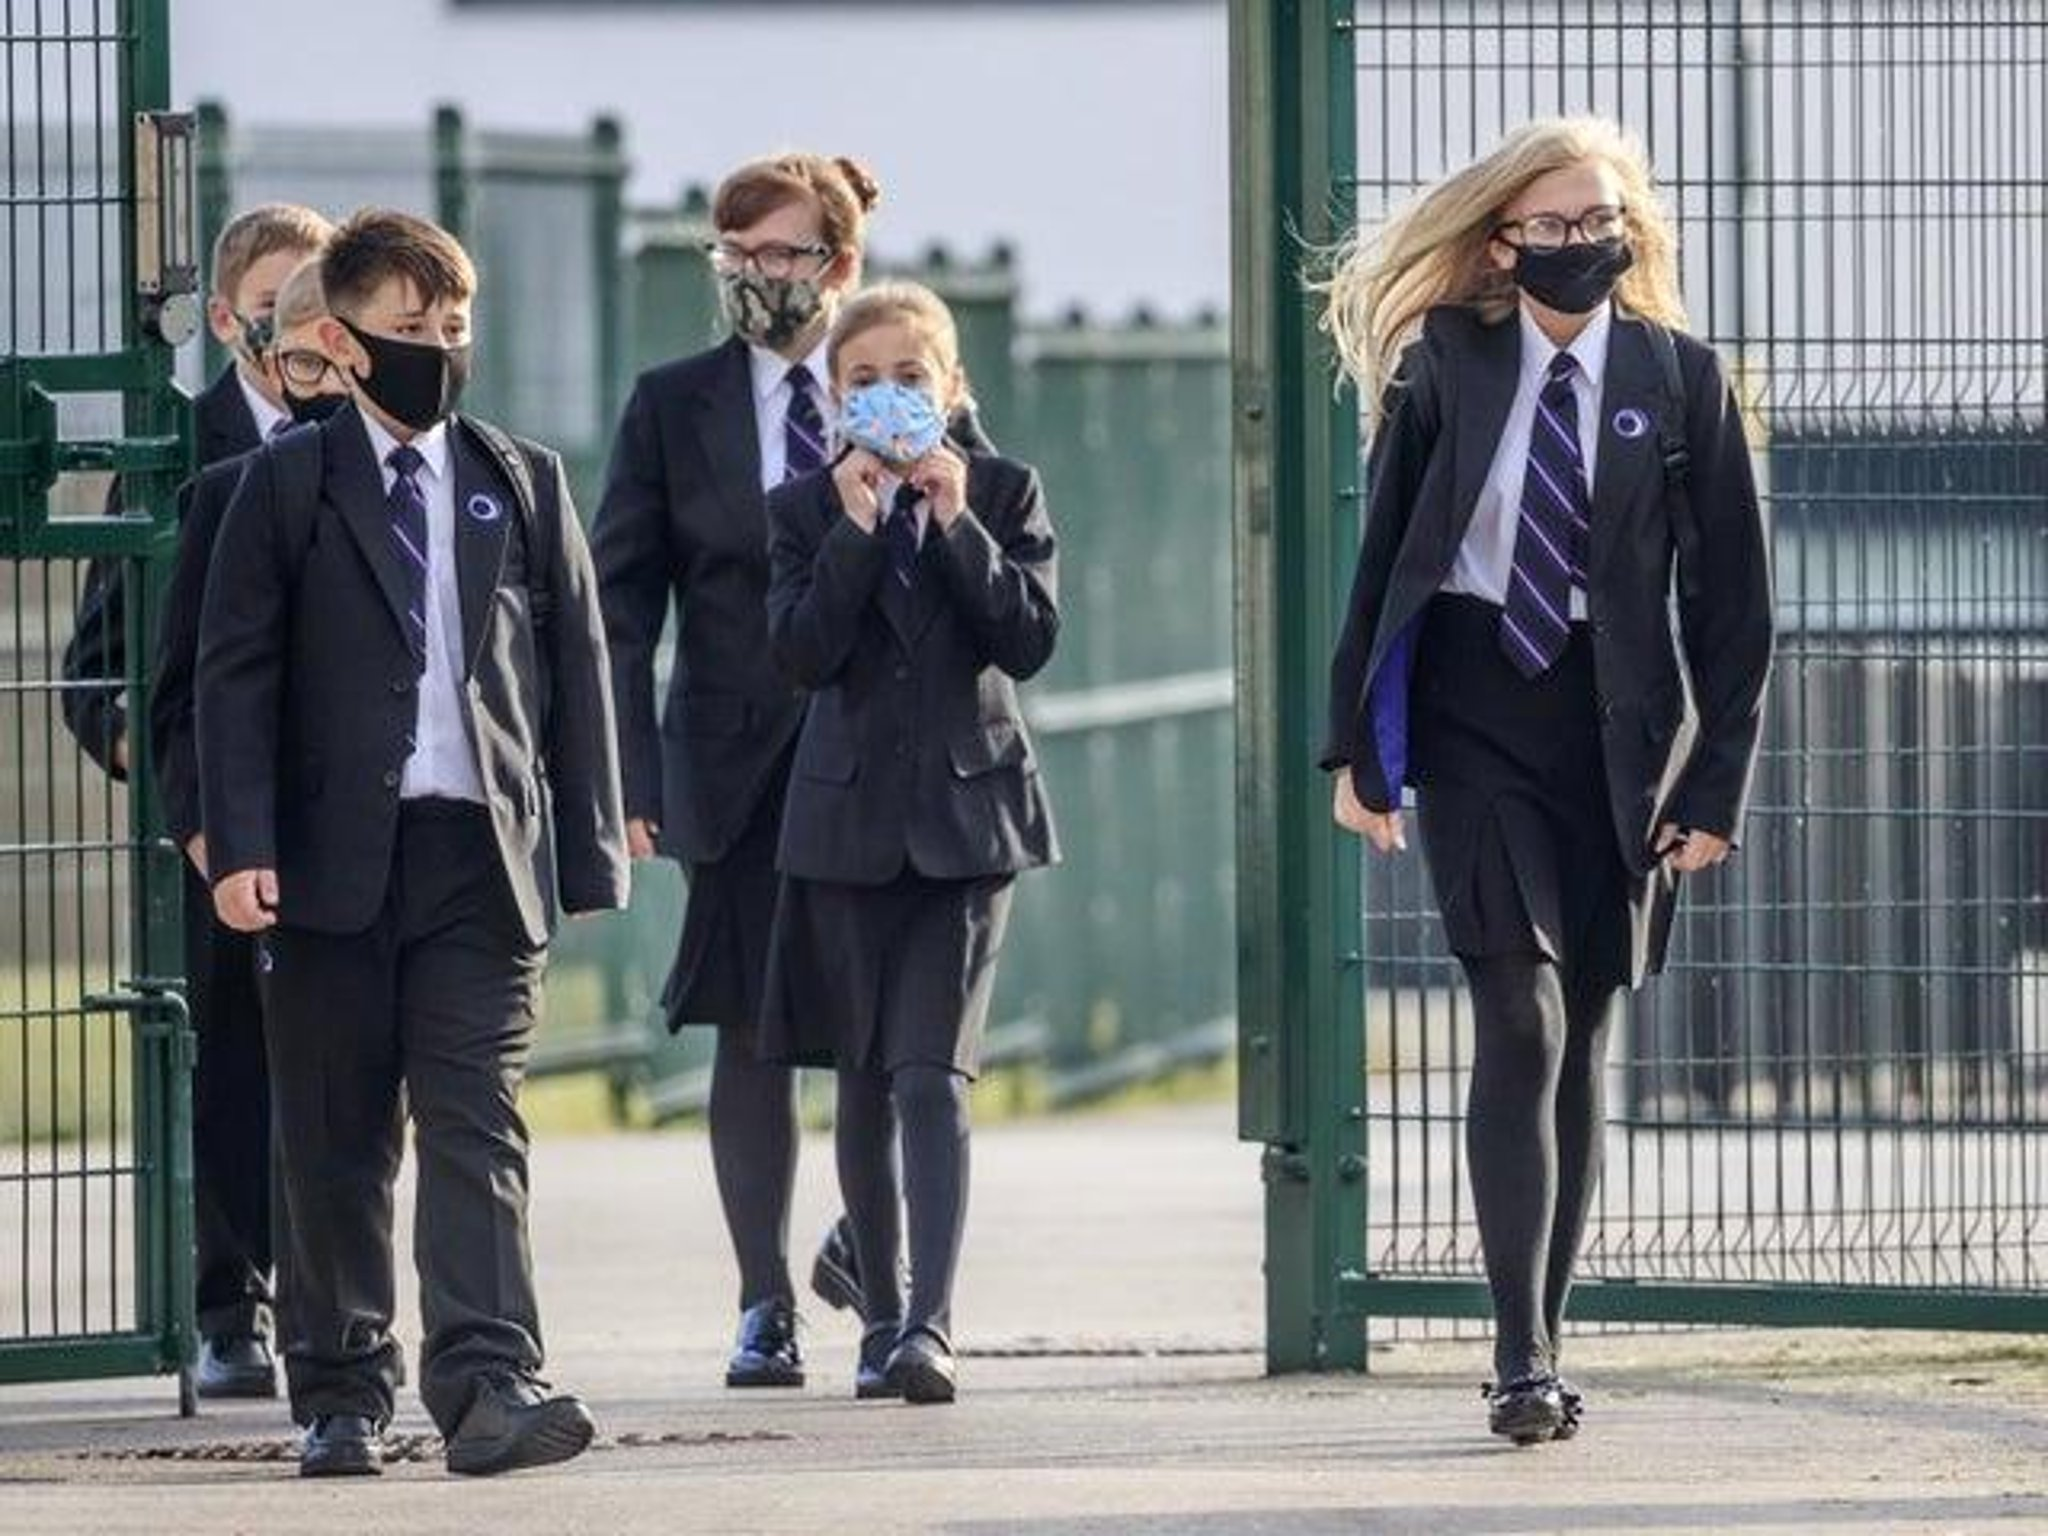 'Destroying a generation' or more Covid safe?: Leeds parents split over school closures